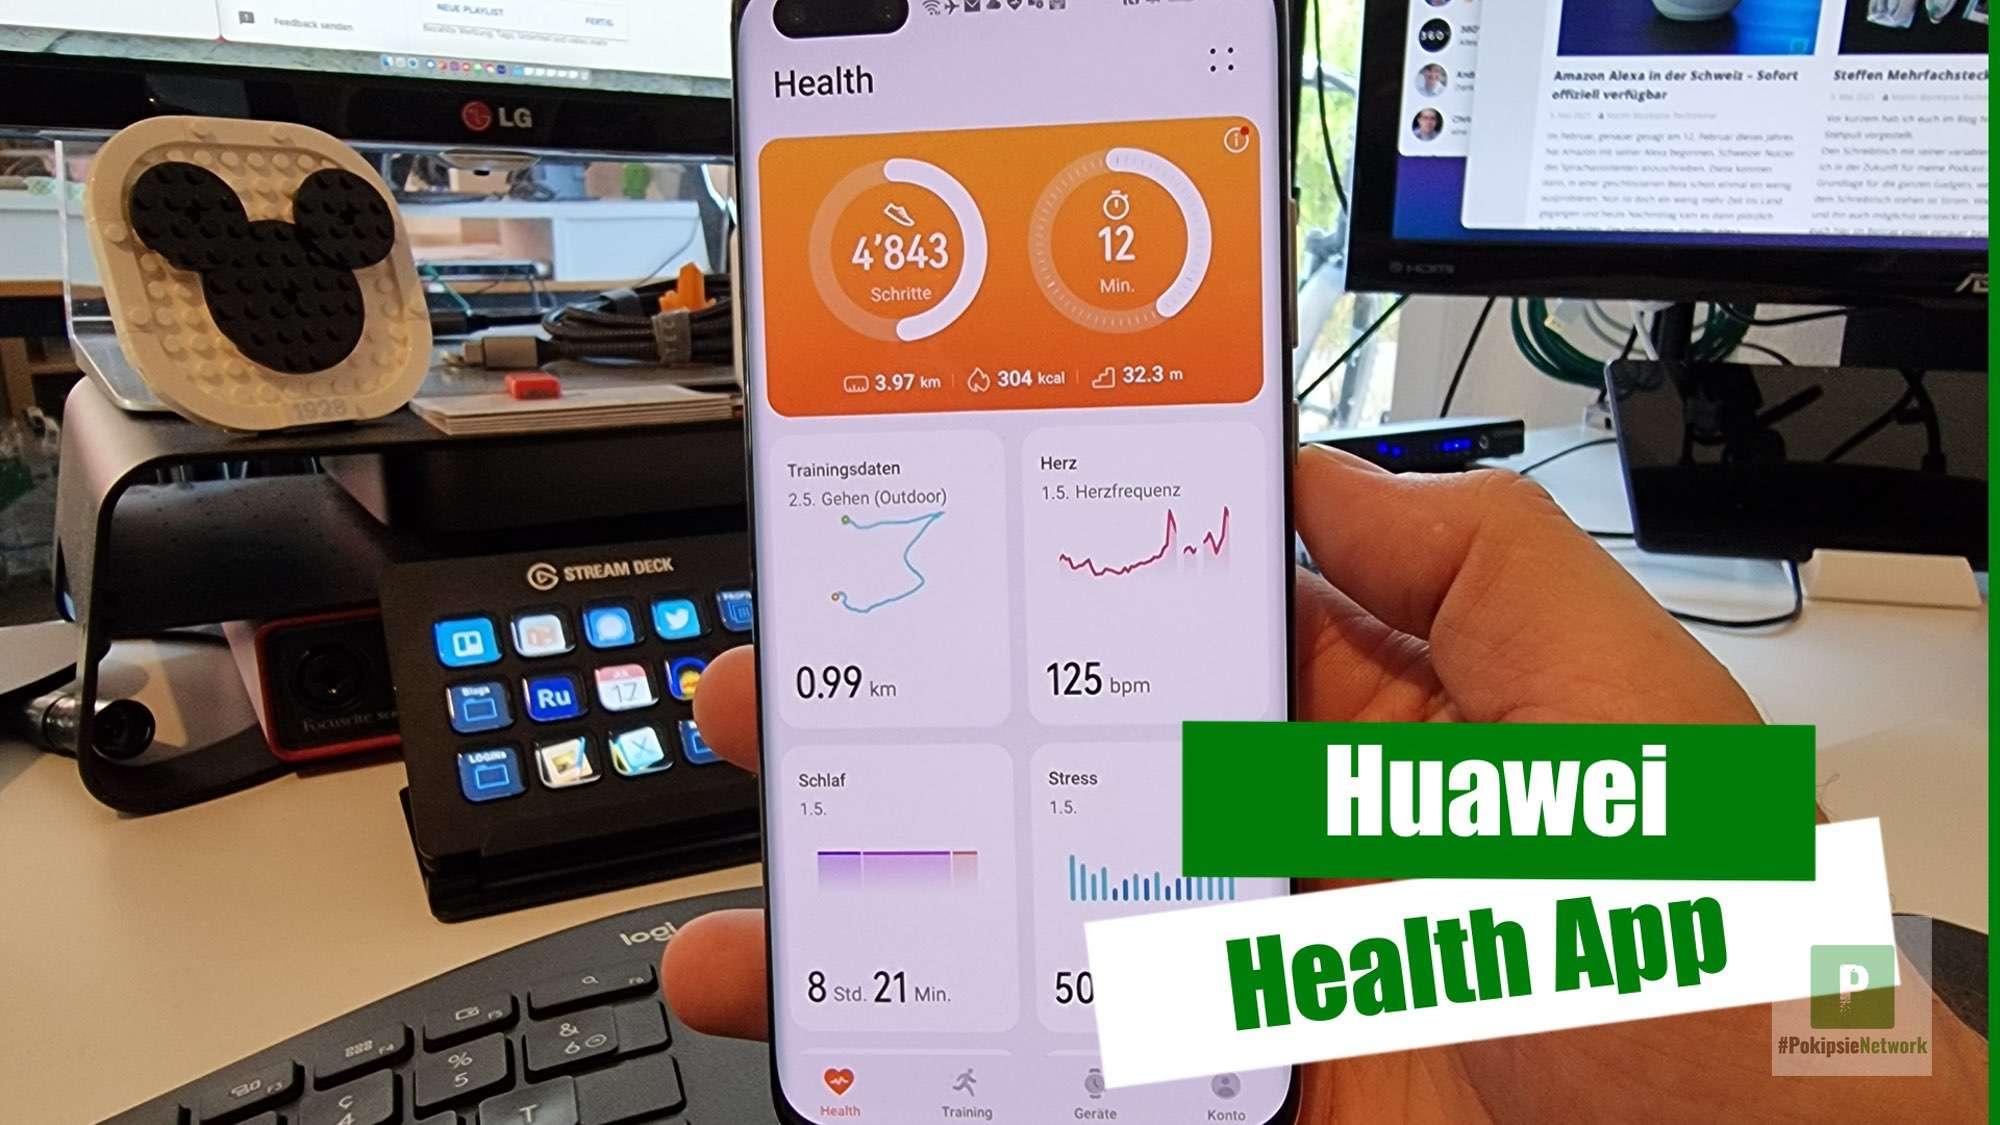 Video – Huawei Health